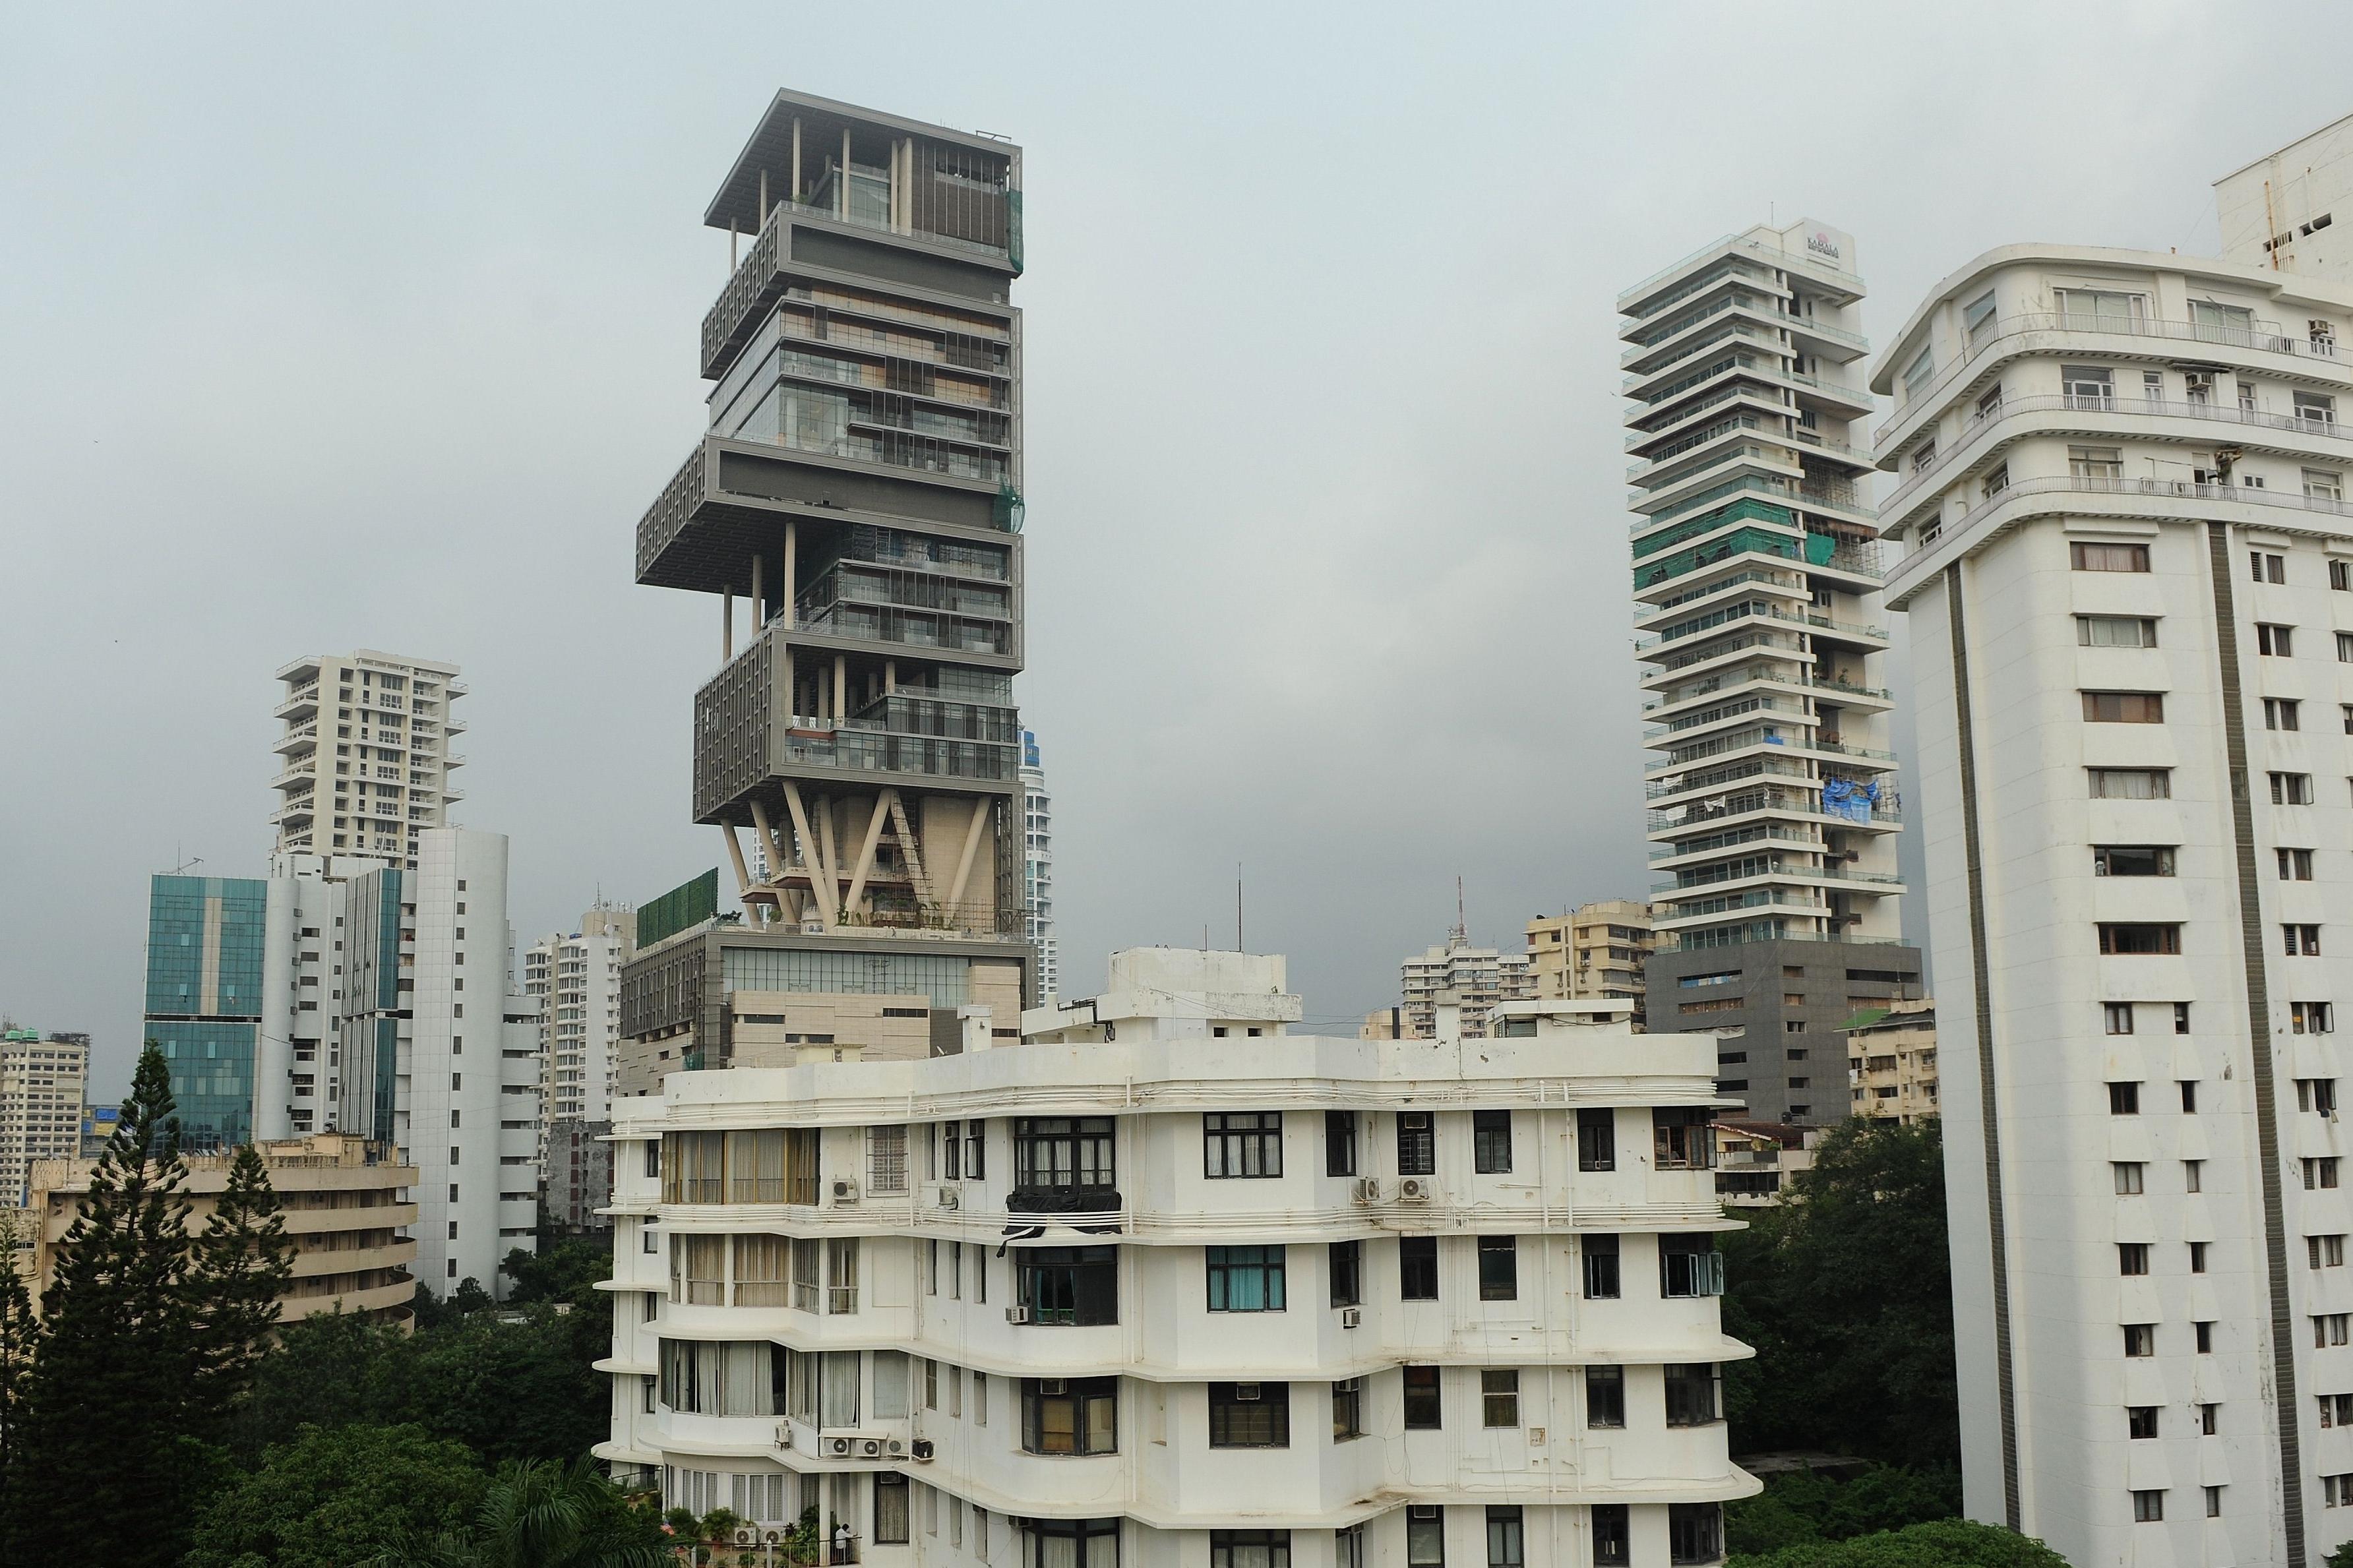 The twenty-seven storey Antilia, the new